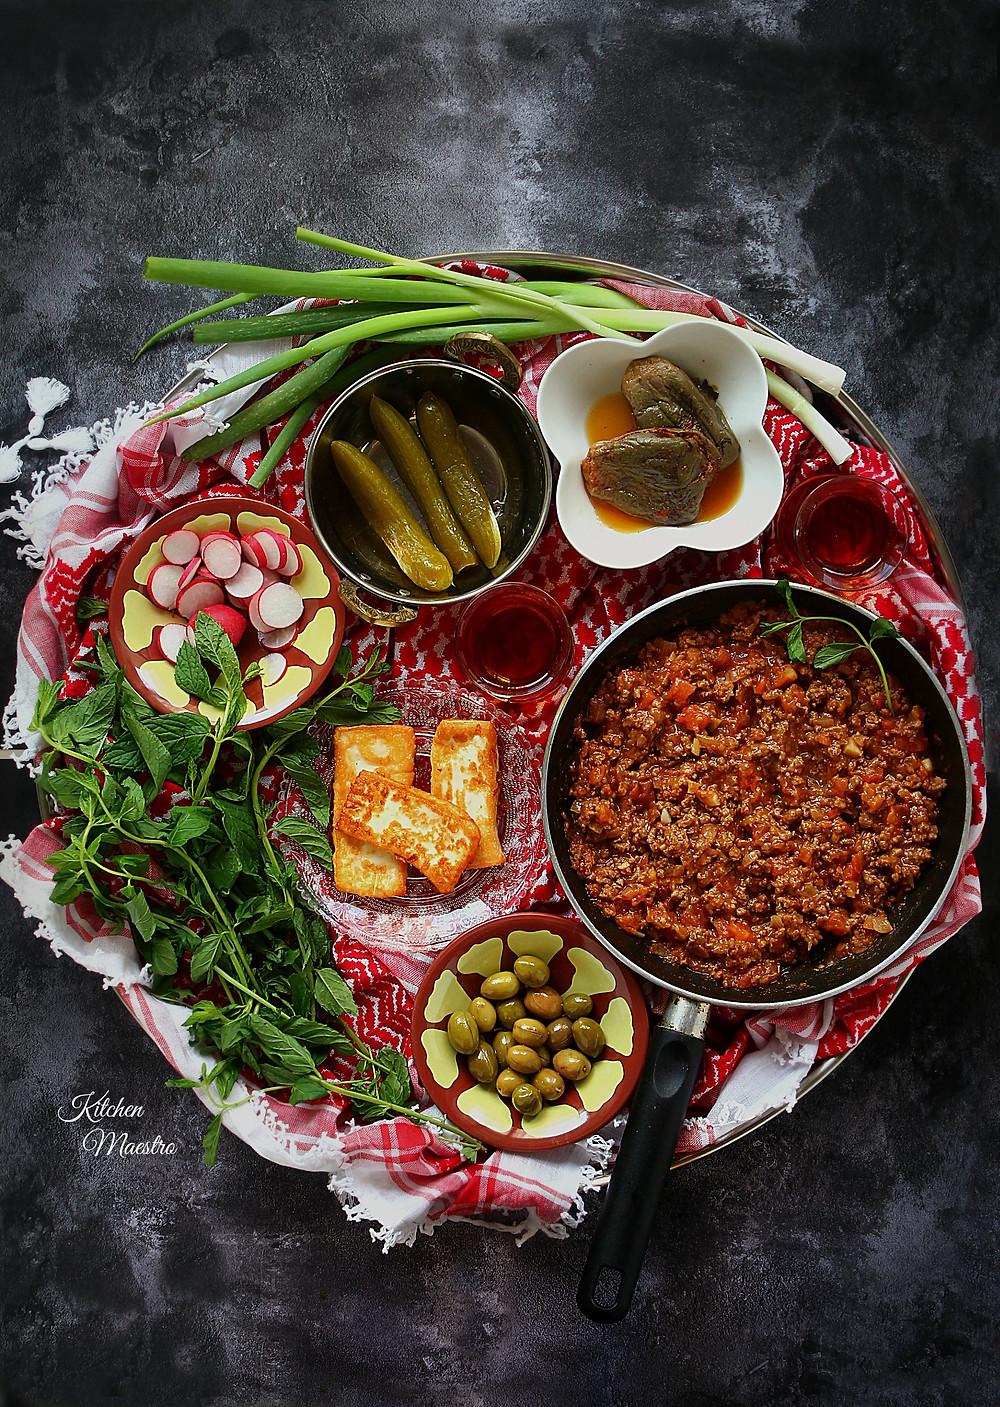 tomato/beef skillet